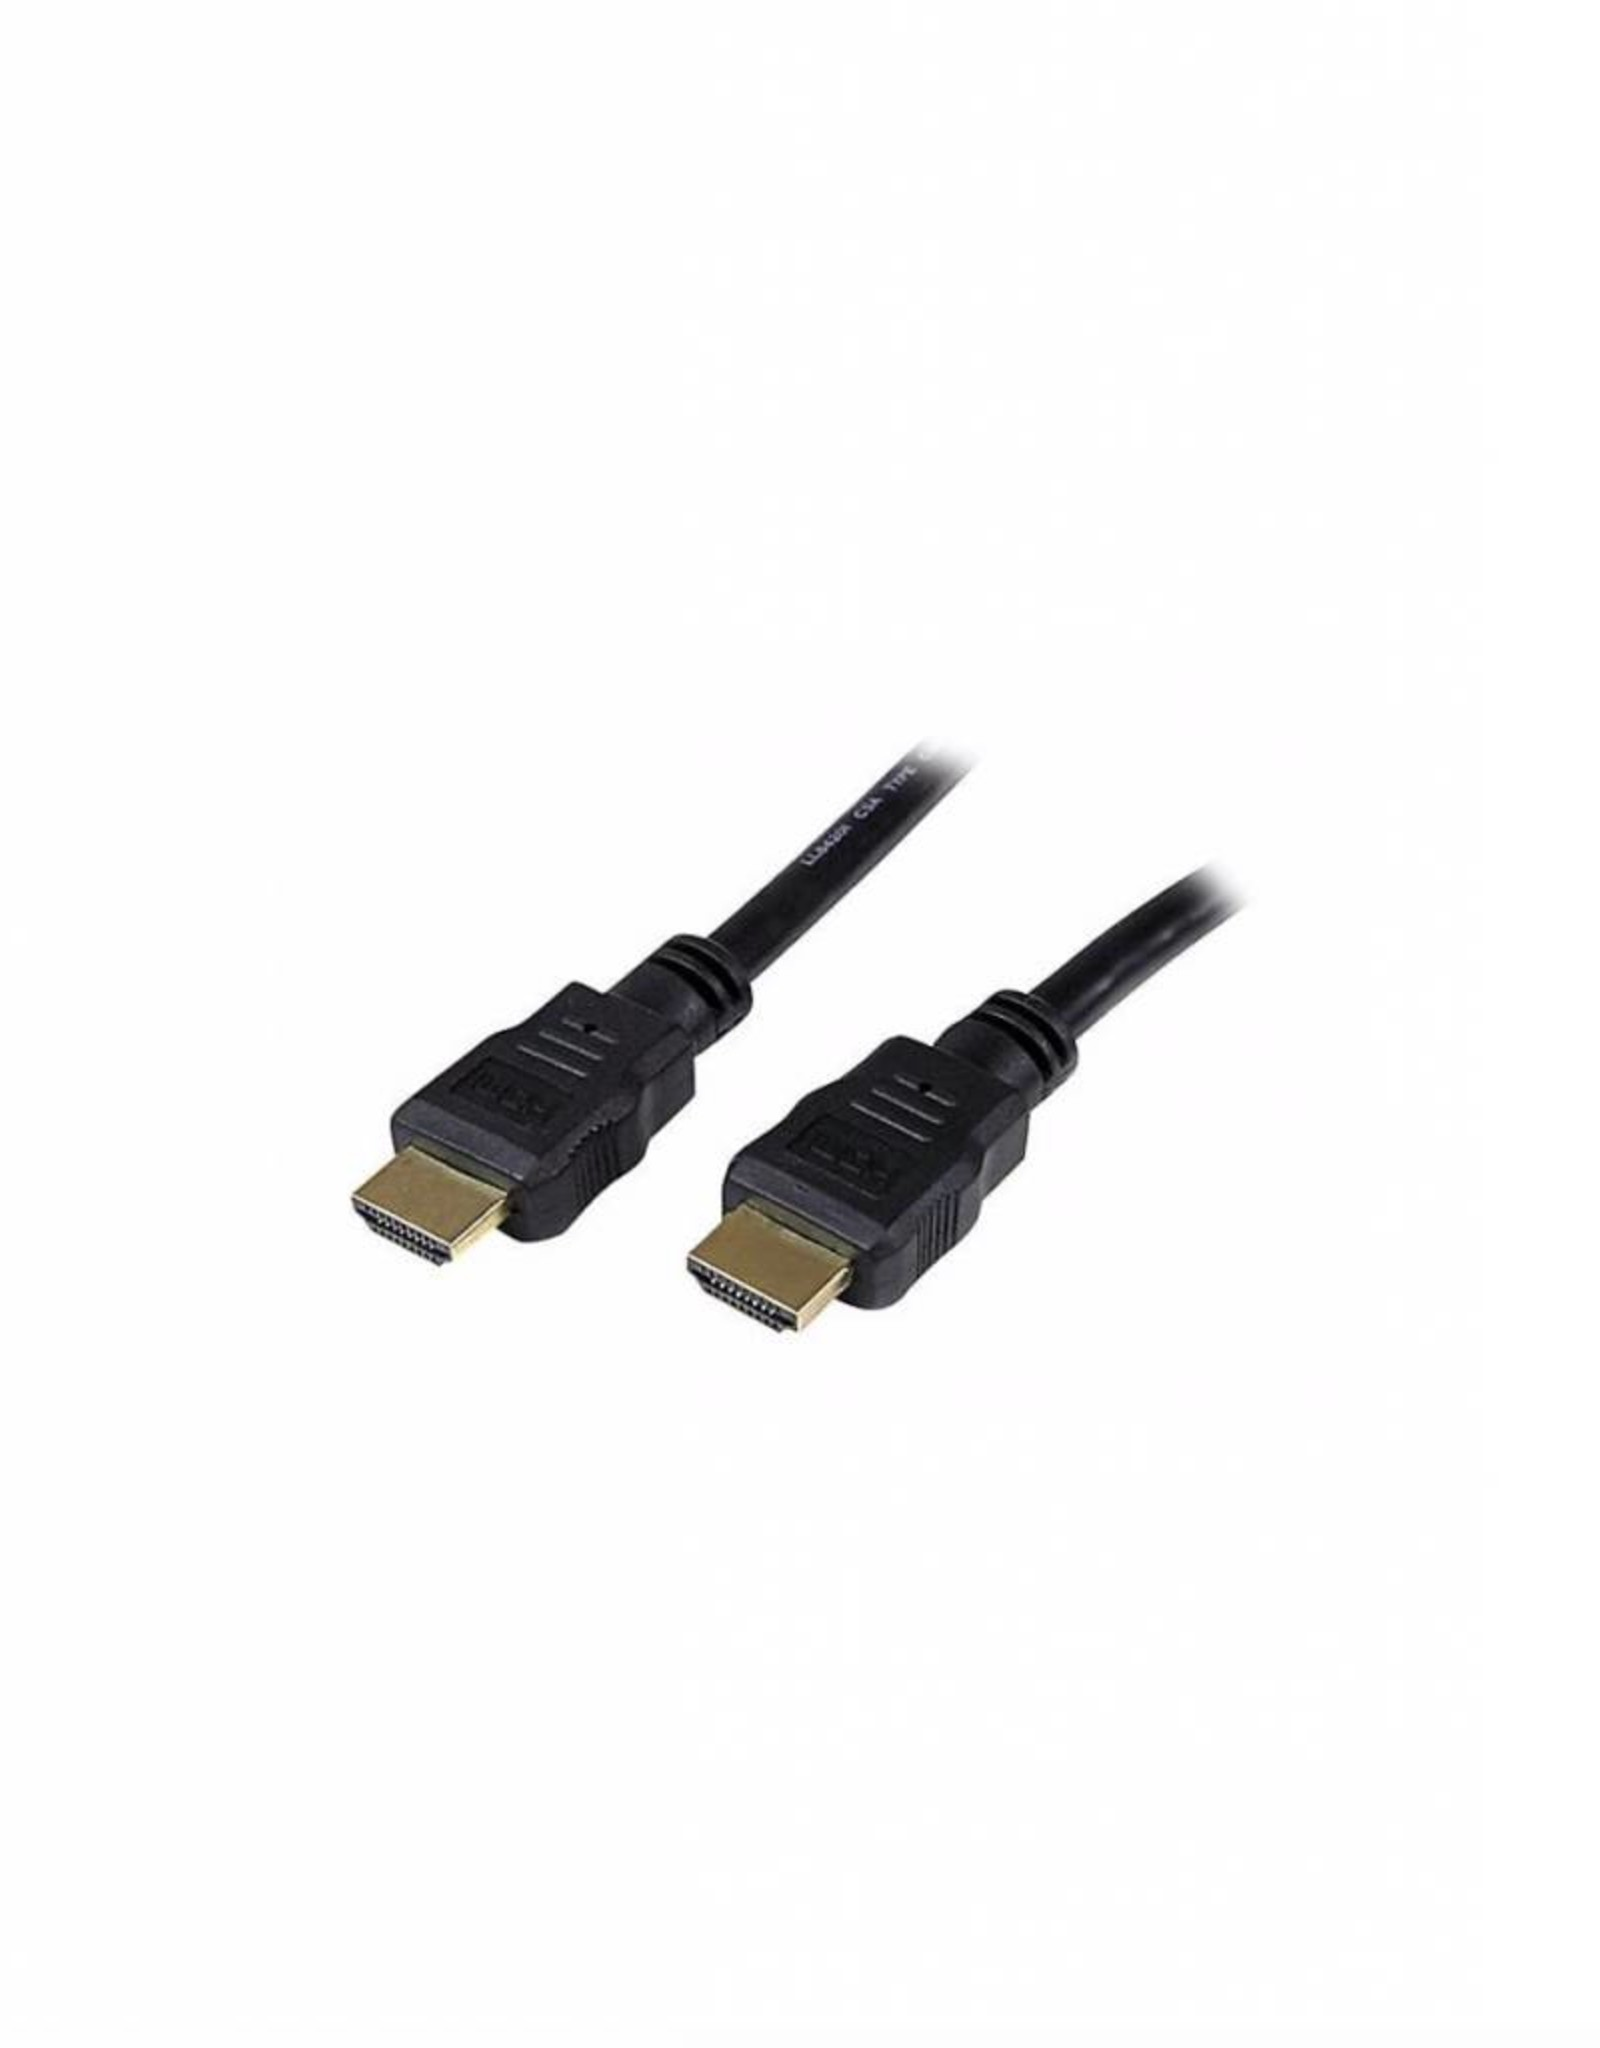 STARTECH.COM STARTECH HDMI CABLE 15'